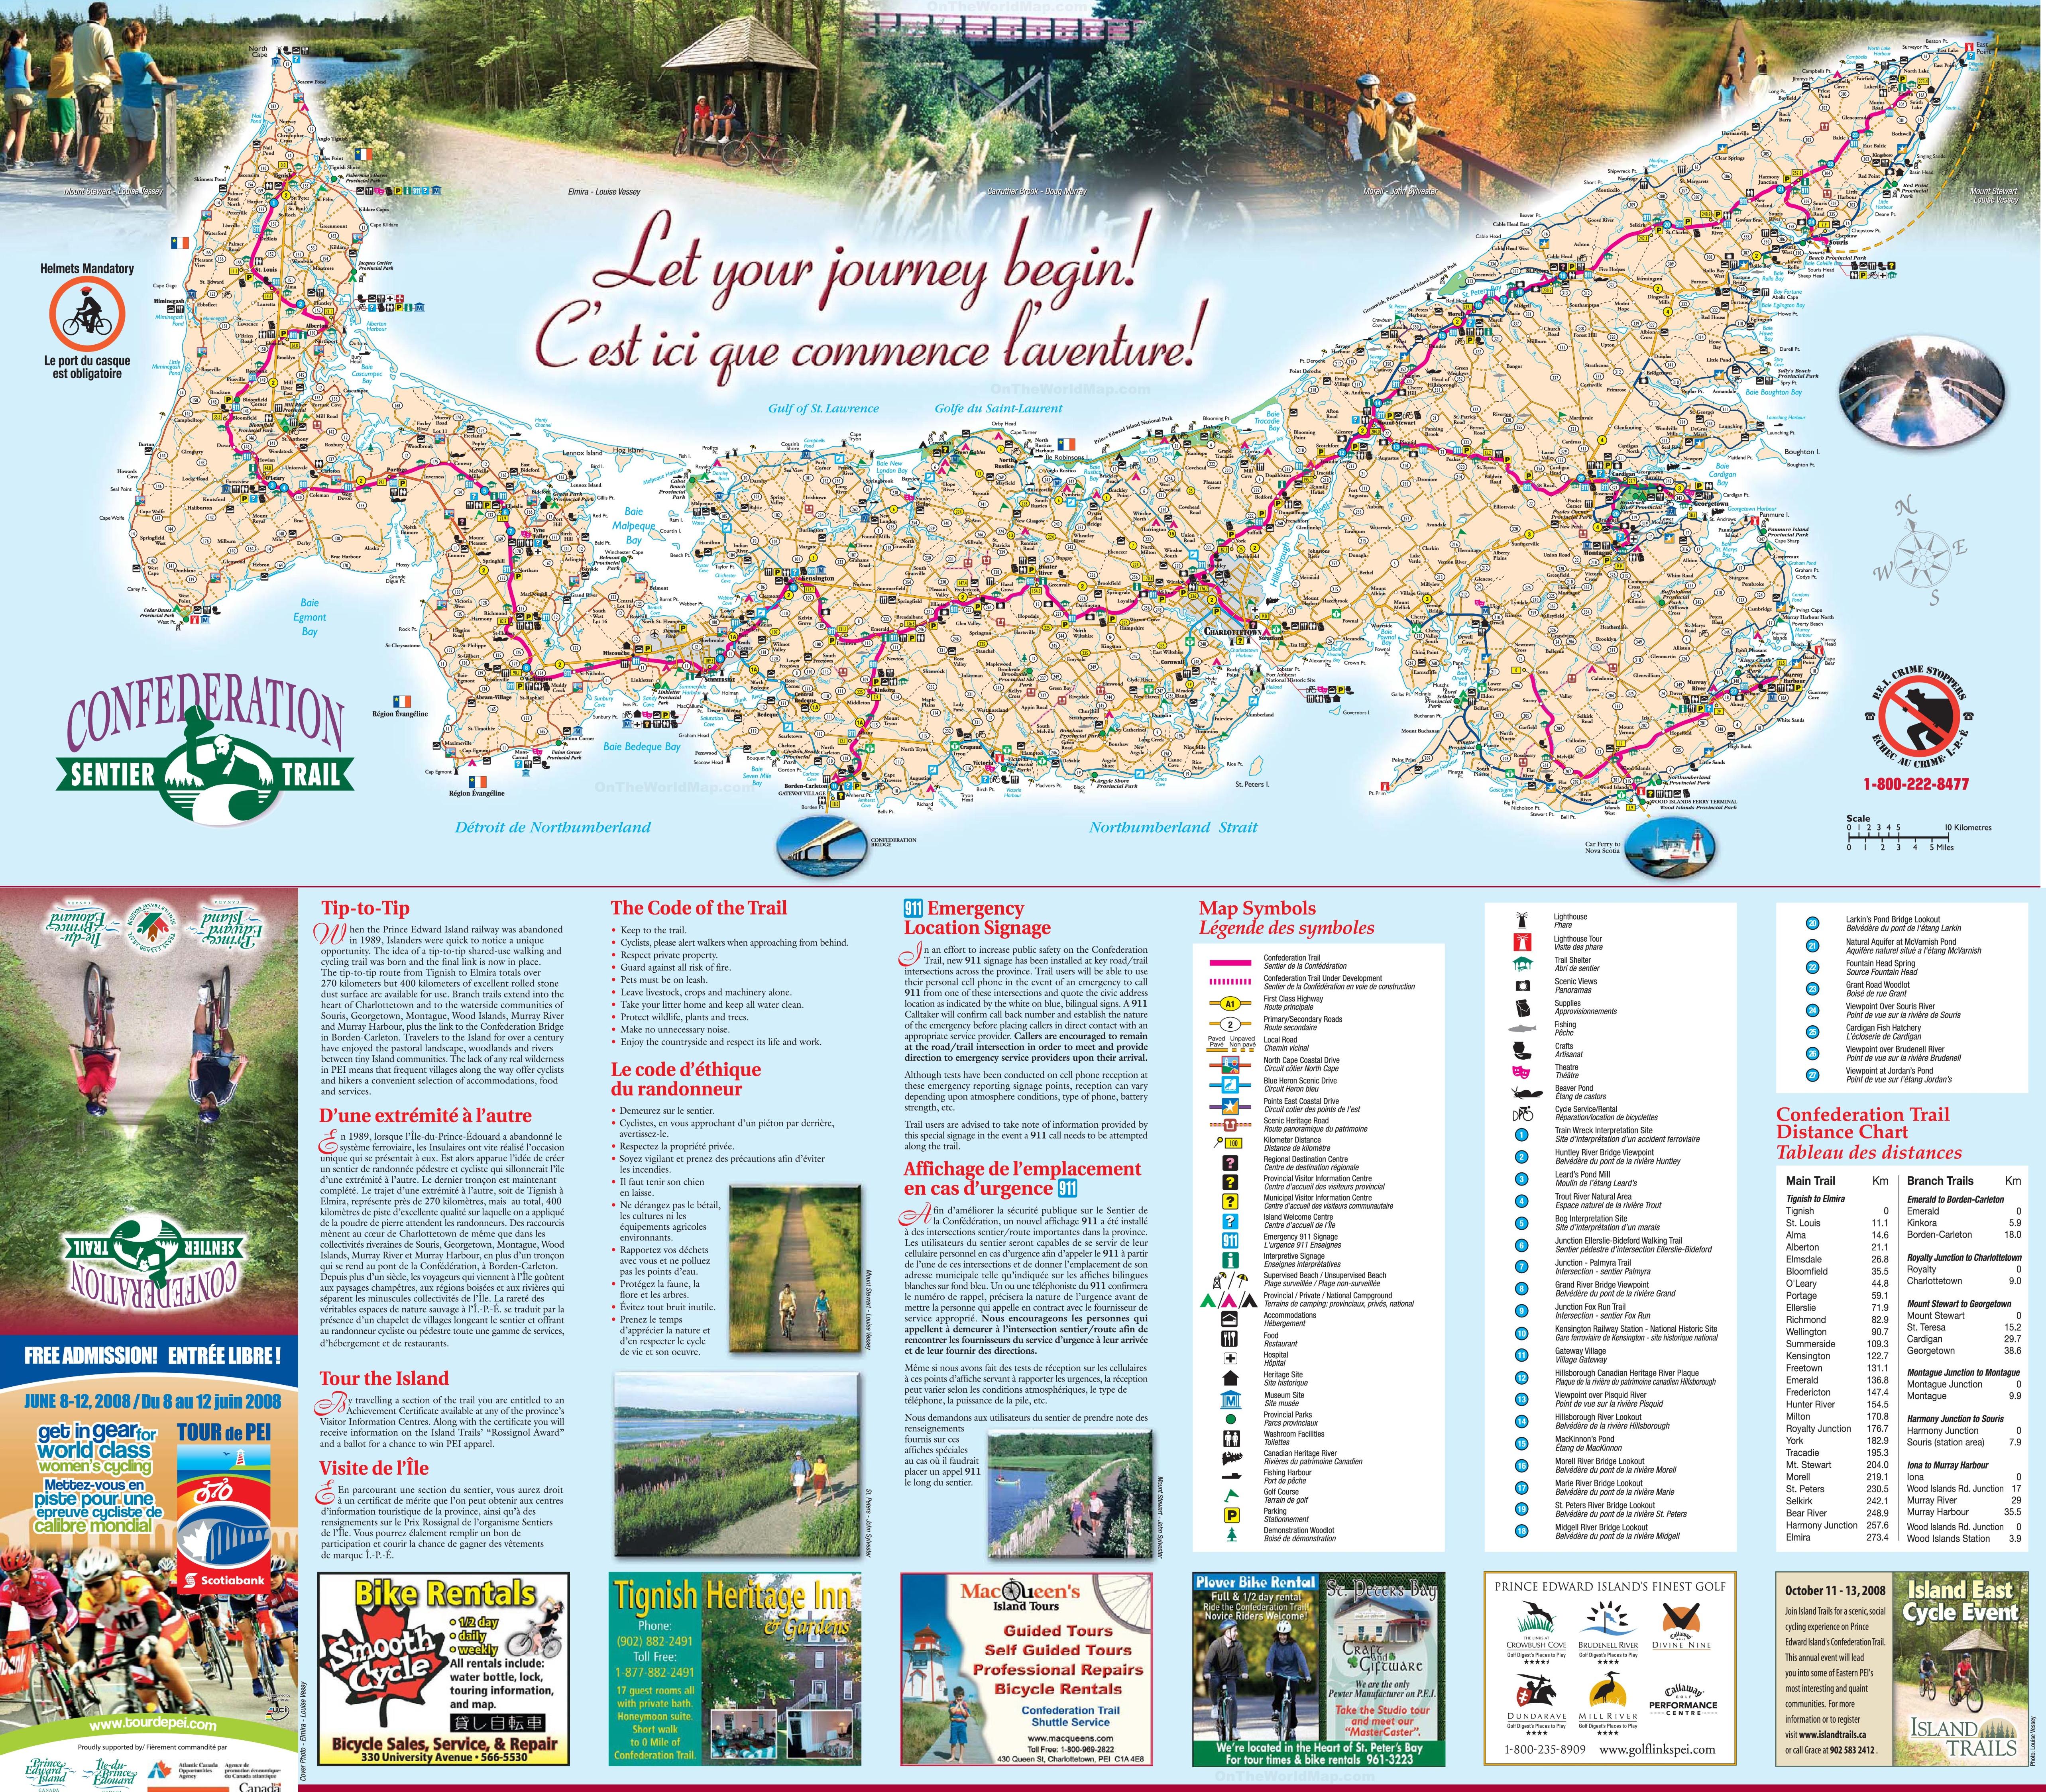 Prince Edward Island tourist map